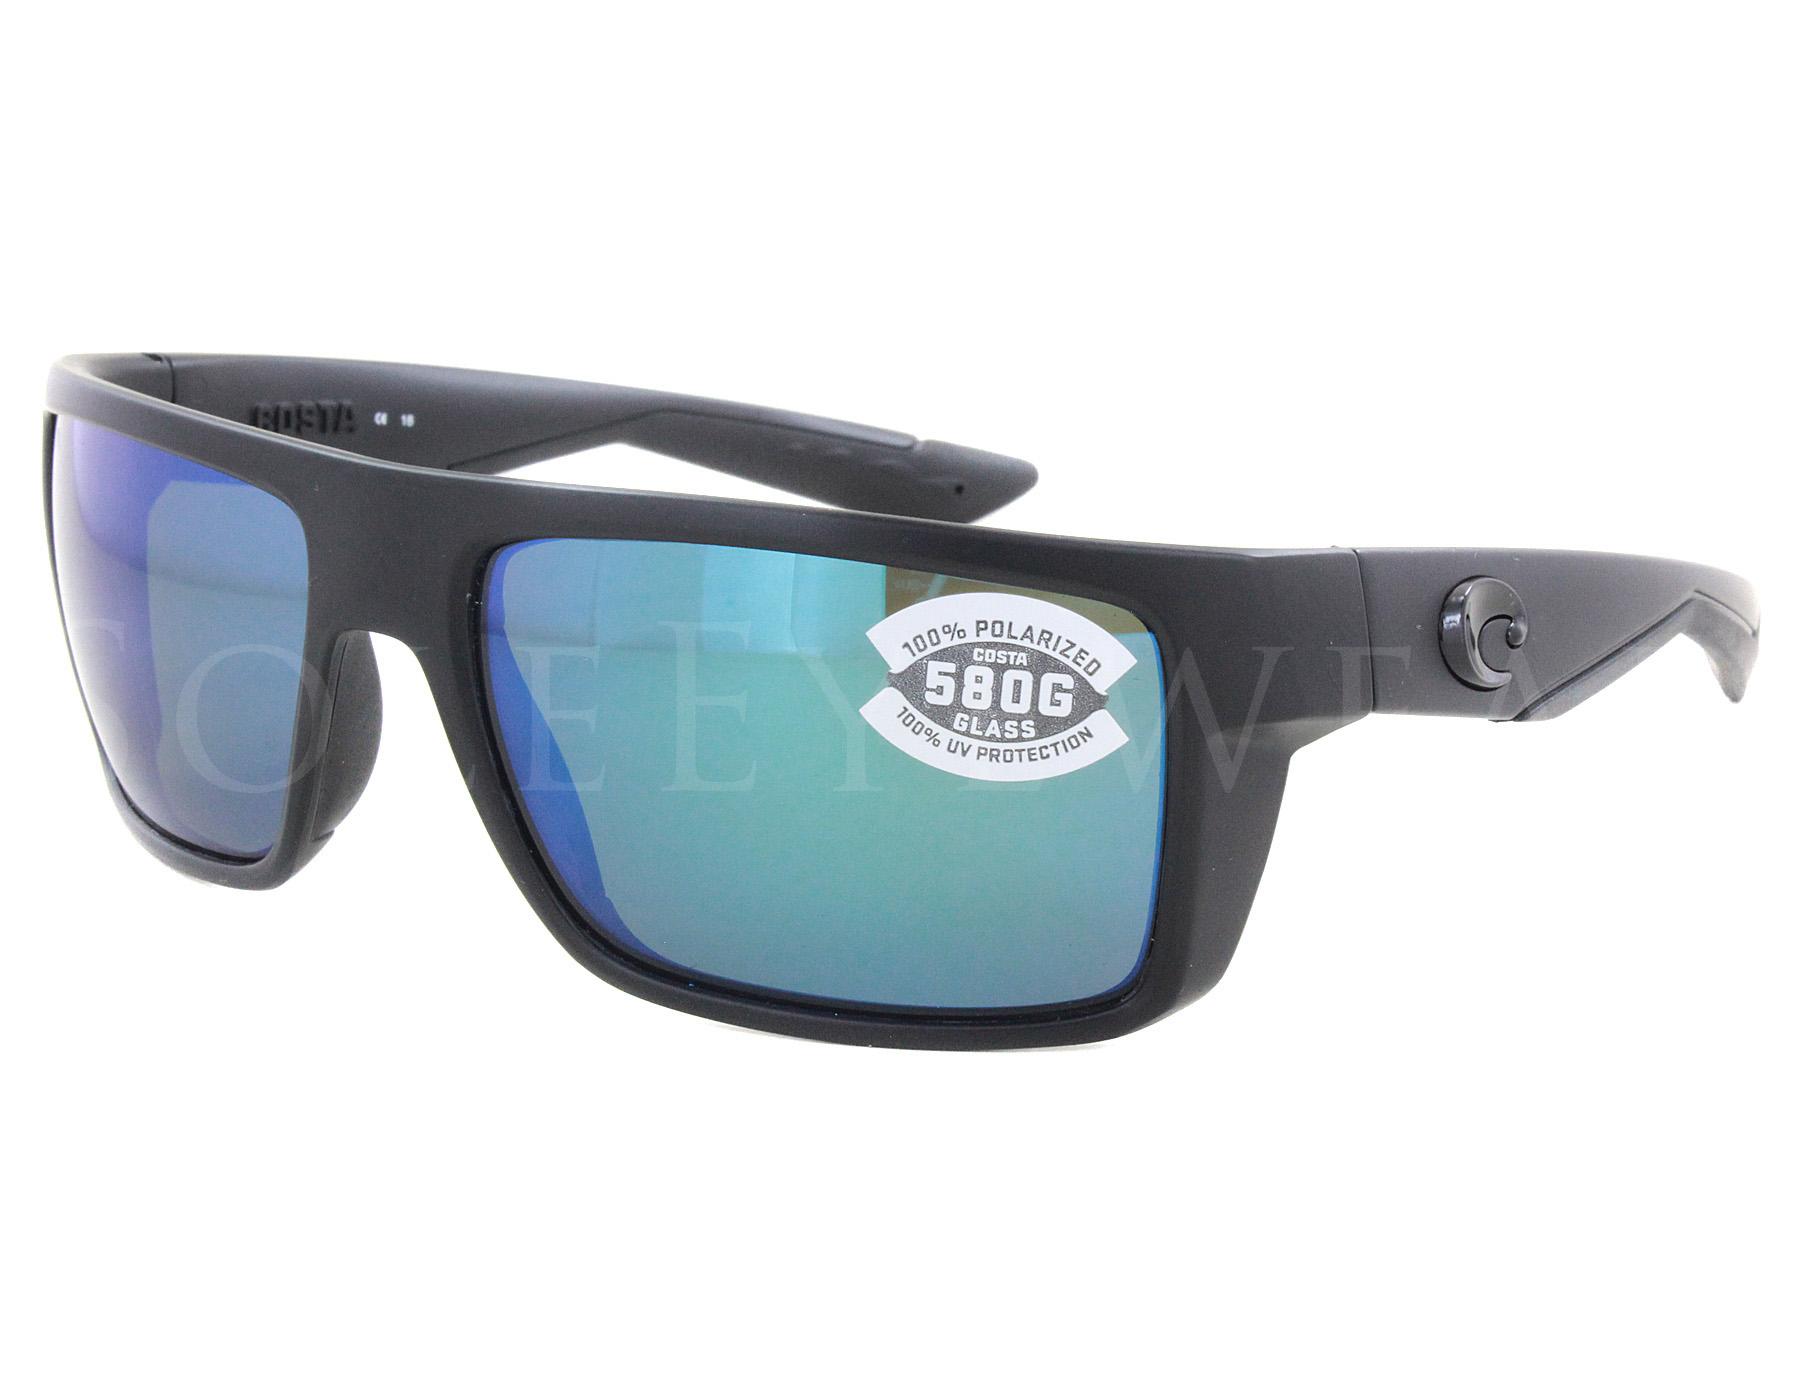 58d71461eeed9 Details about New Costa del Mar Motu Blue Mirror MTU01-OBMGLP580G Sunglasses